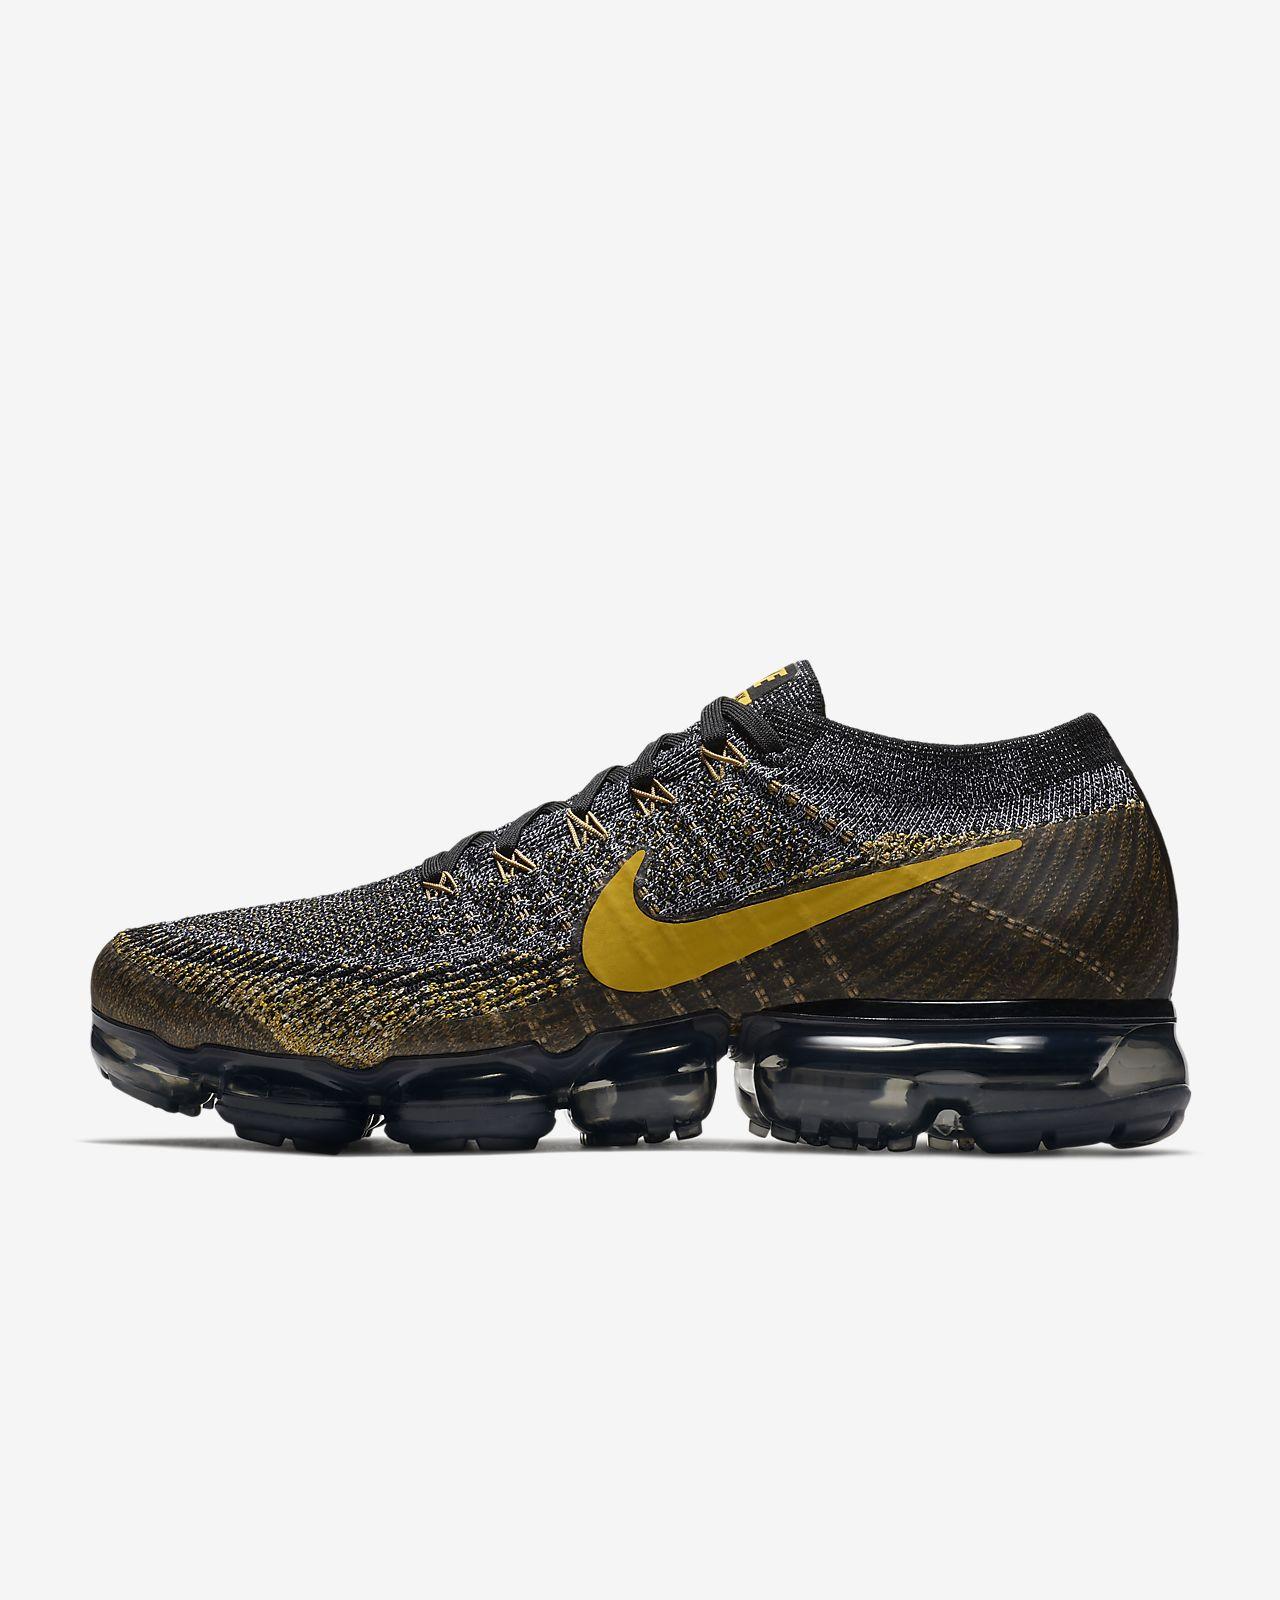 Mens Nike Air Vapormax Flyknit Running Shoes